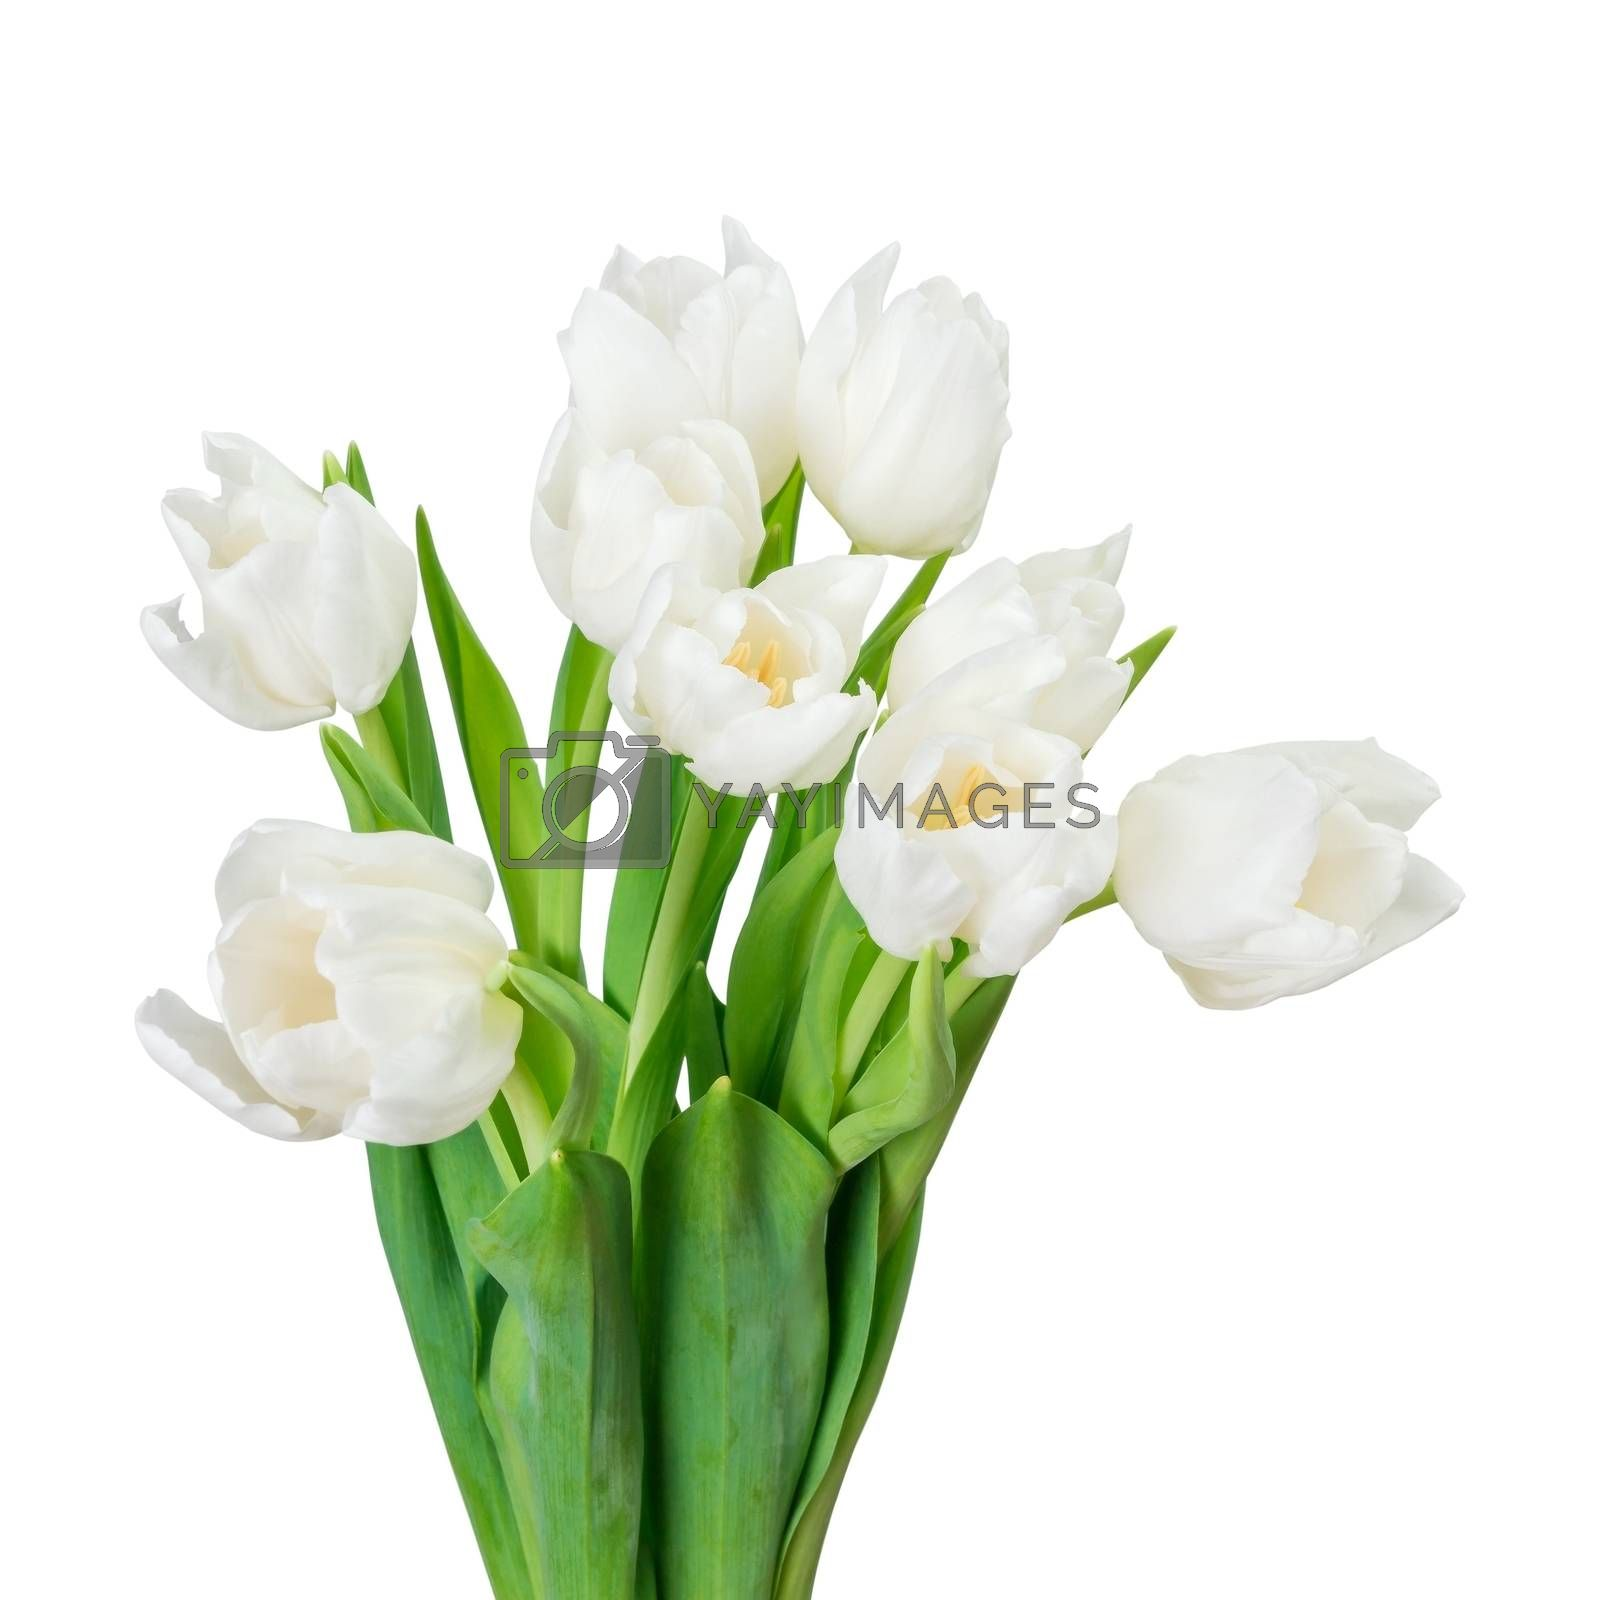 White tulip isolated